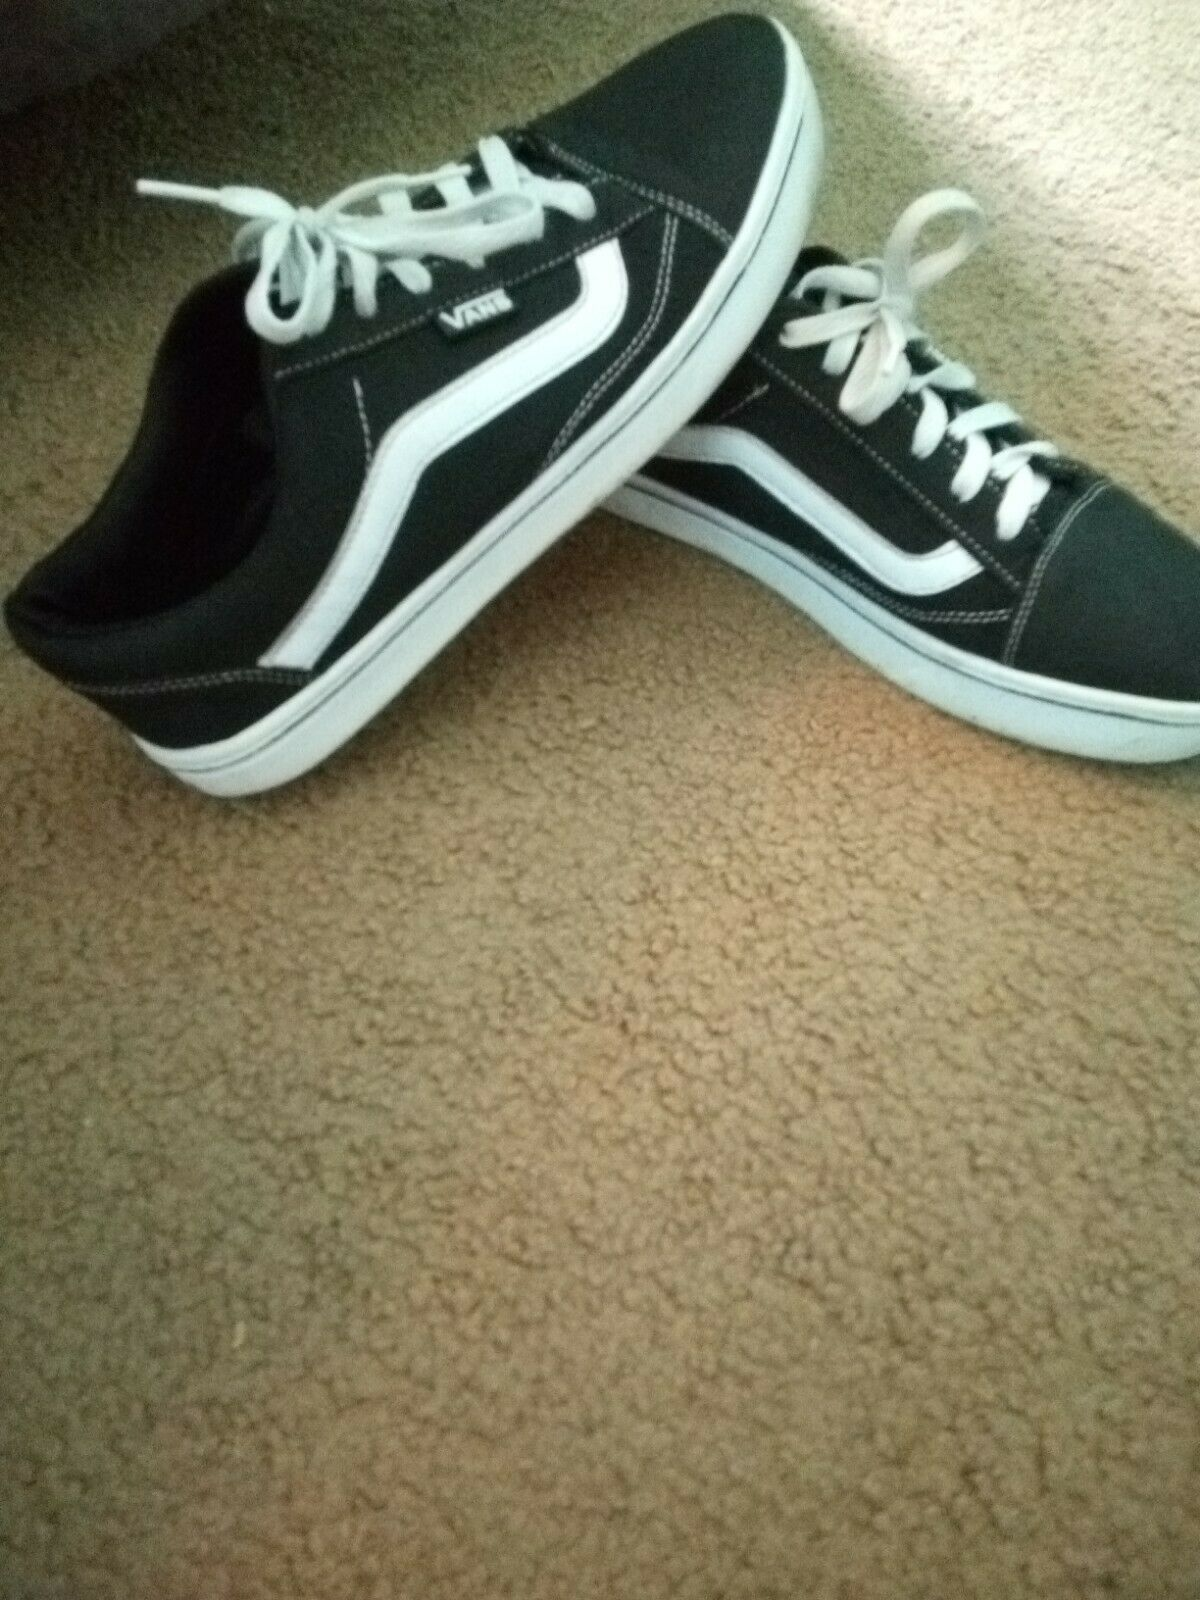 Details about New Men women Vans Old Skool Black Skateboarding Shoes Classic Canvas Suede